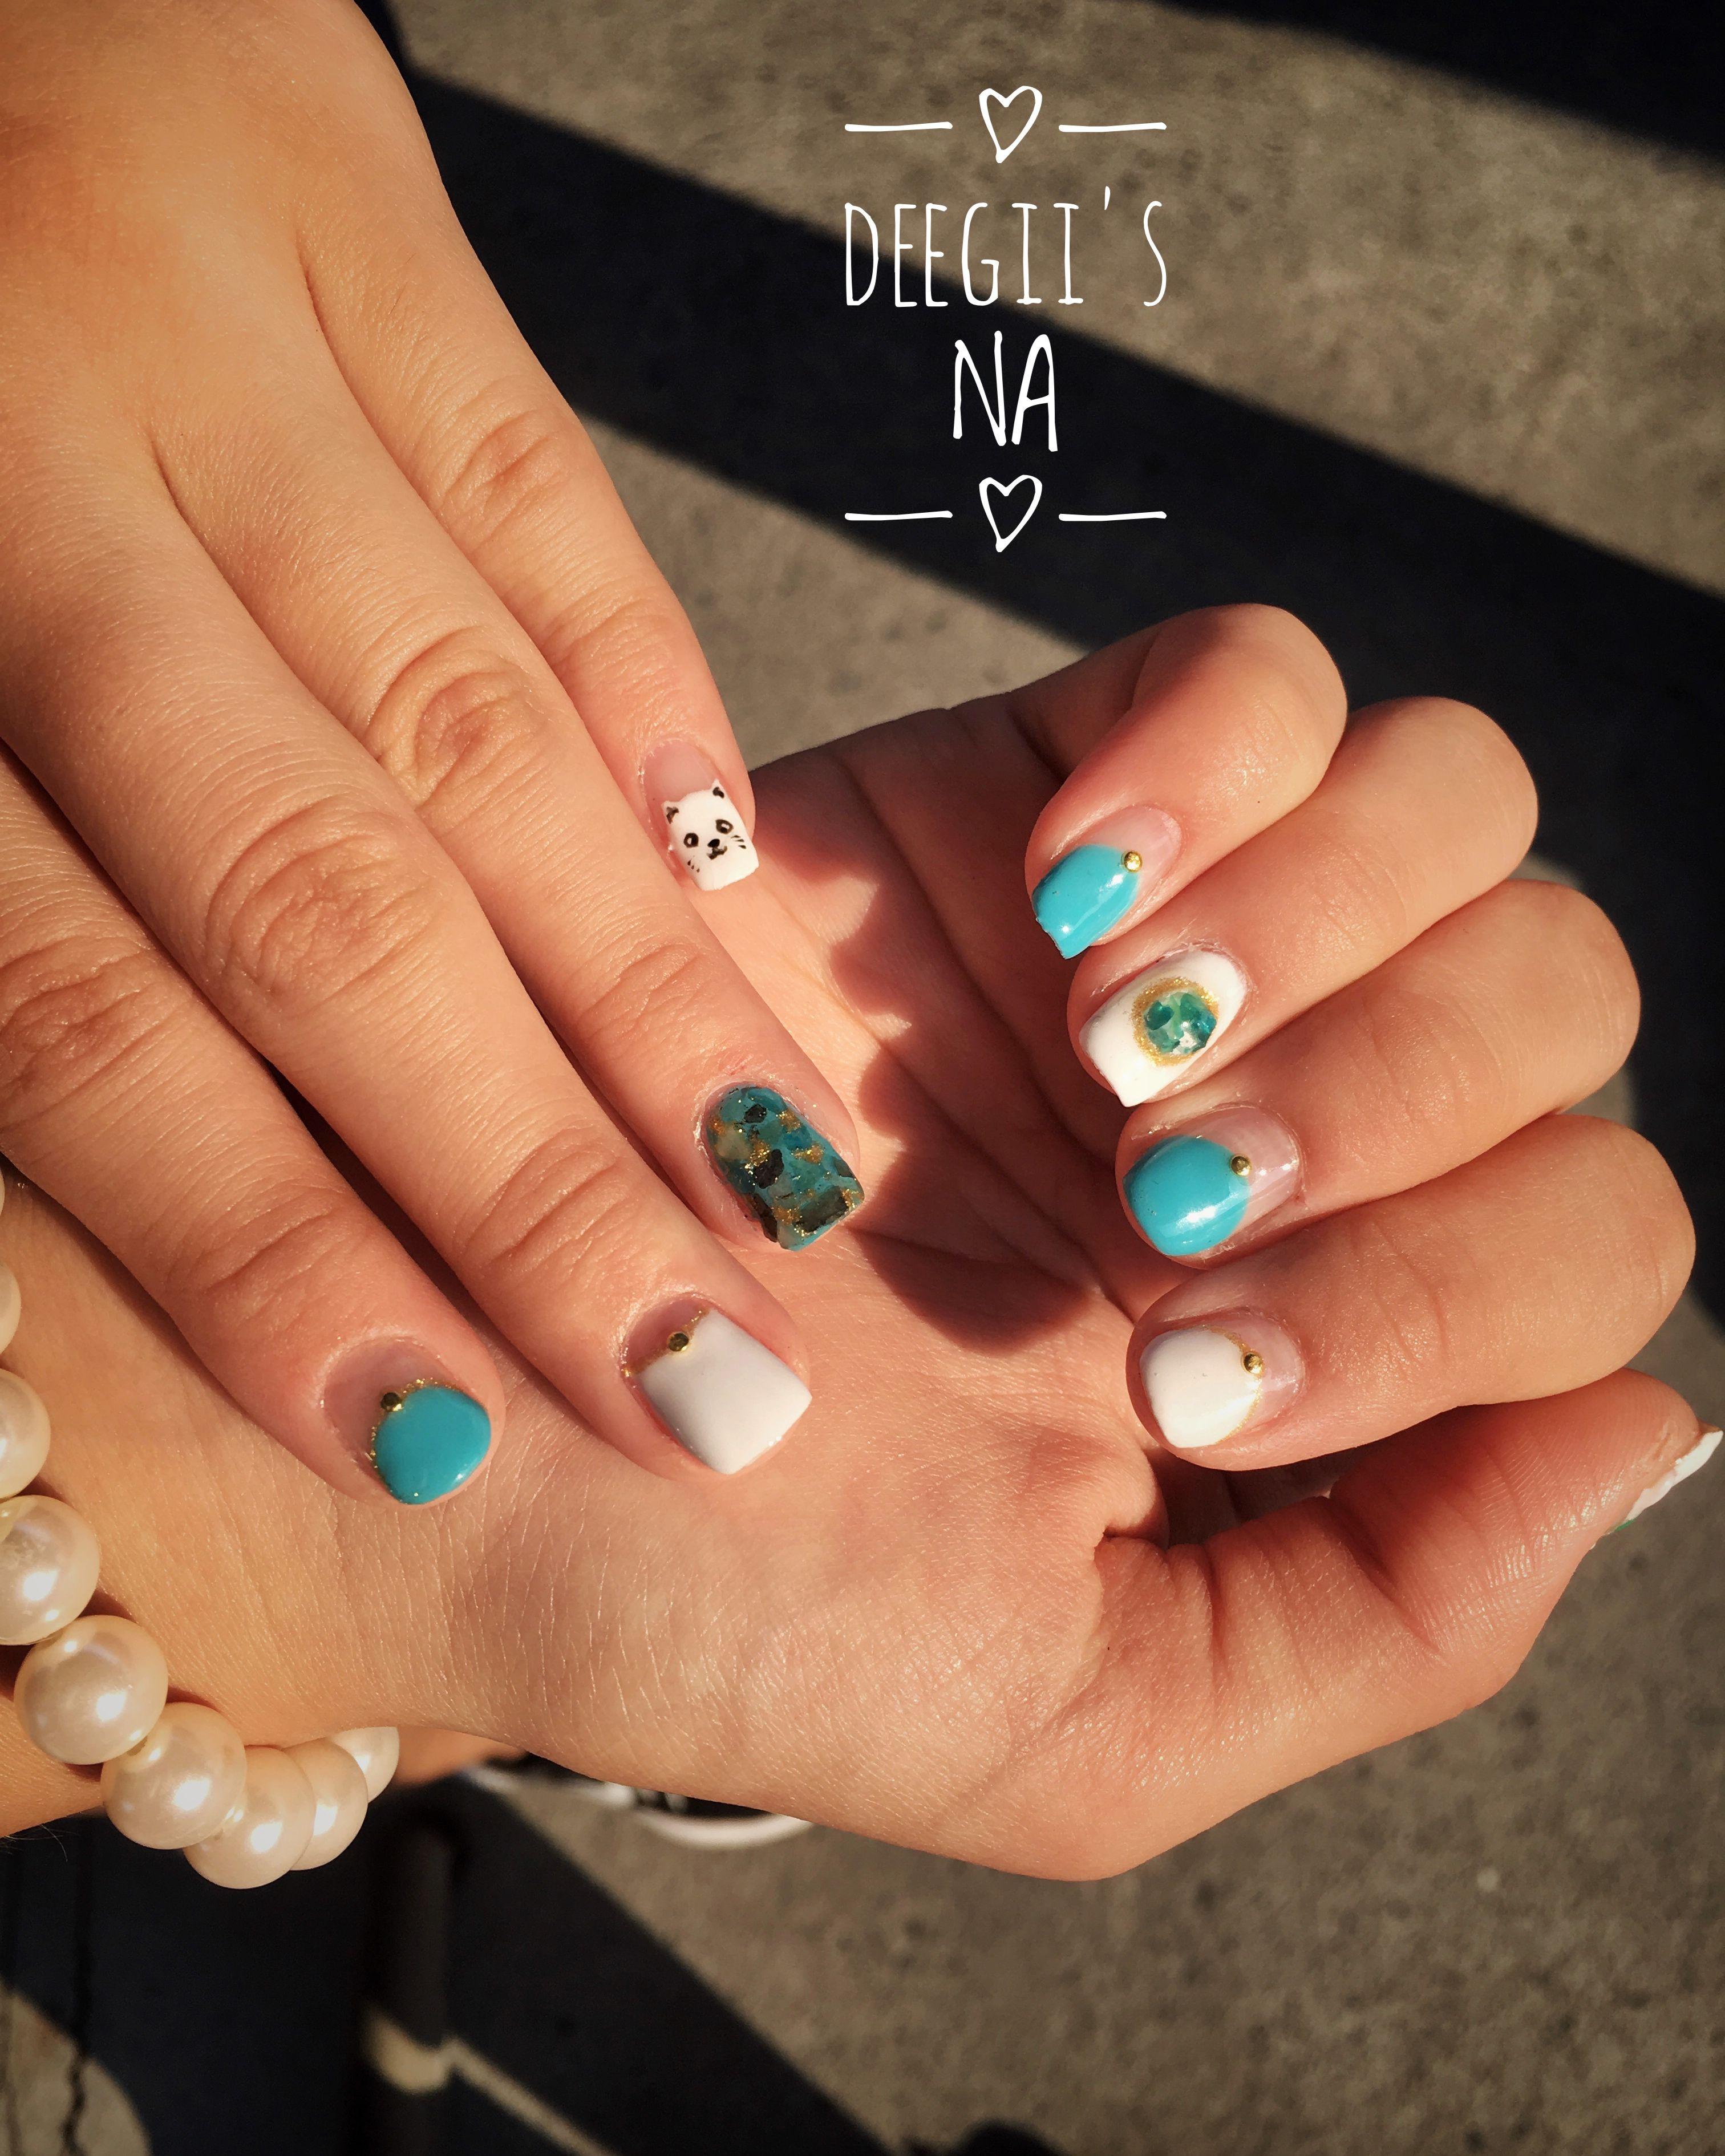 Japanese nail art. | Deegii\'s Nail Art | Pinterest | Japanese nail art